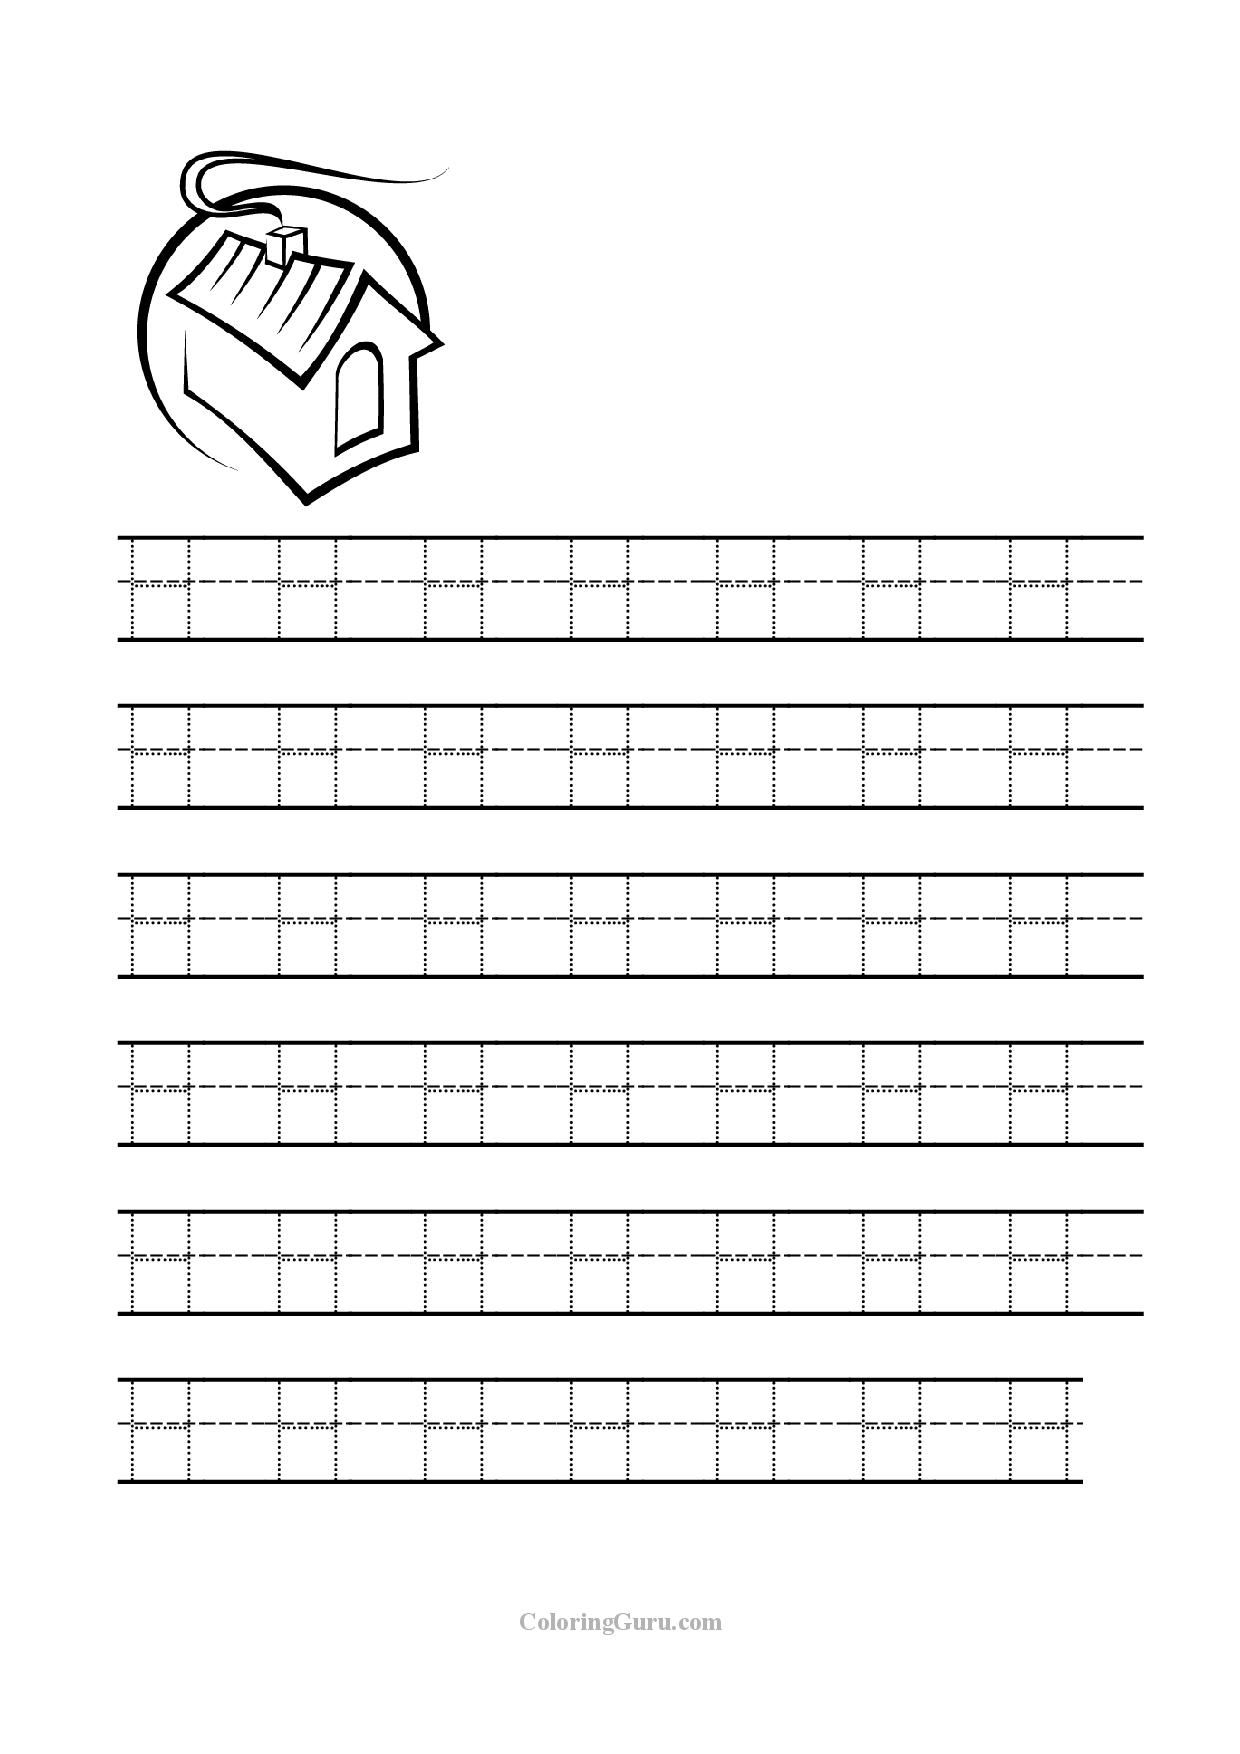 Letter H Tracing Worksheets Worksheets For All   Alphabet pertaining to Letter H Tracing Worksheets